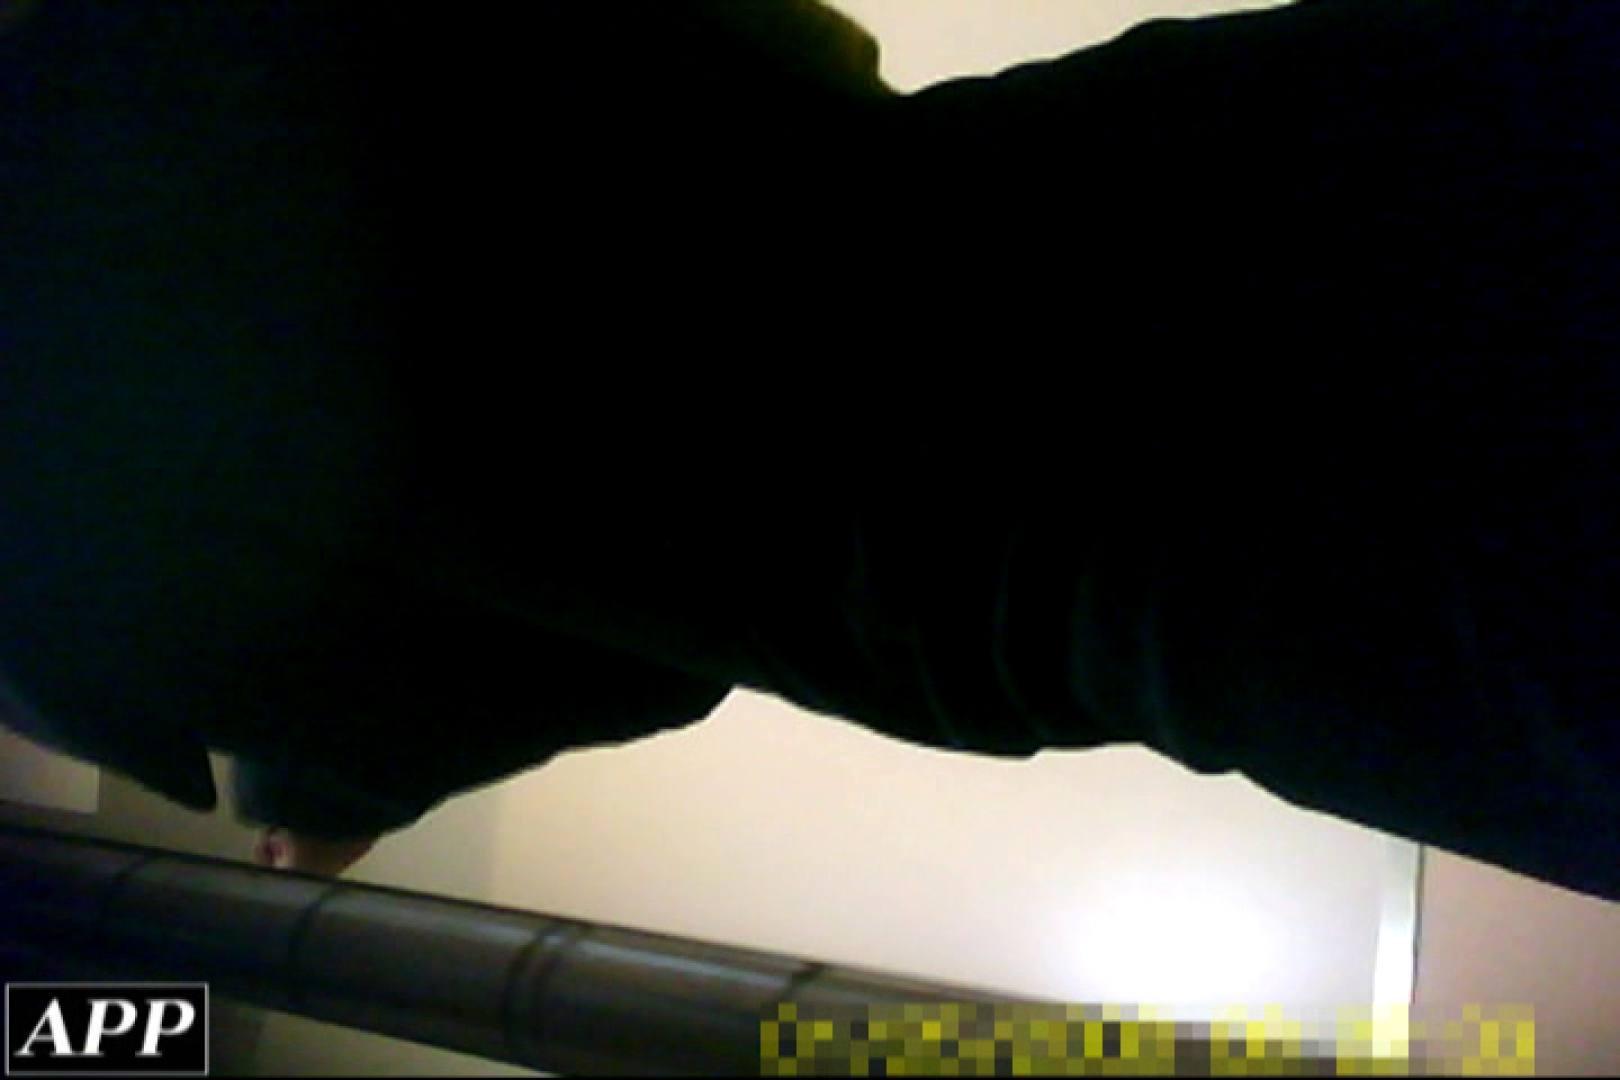 3視点洗面所 vol.57 OLハメ撮り  76Pix 39